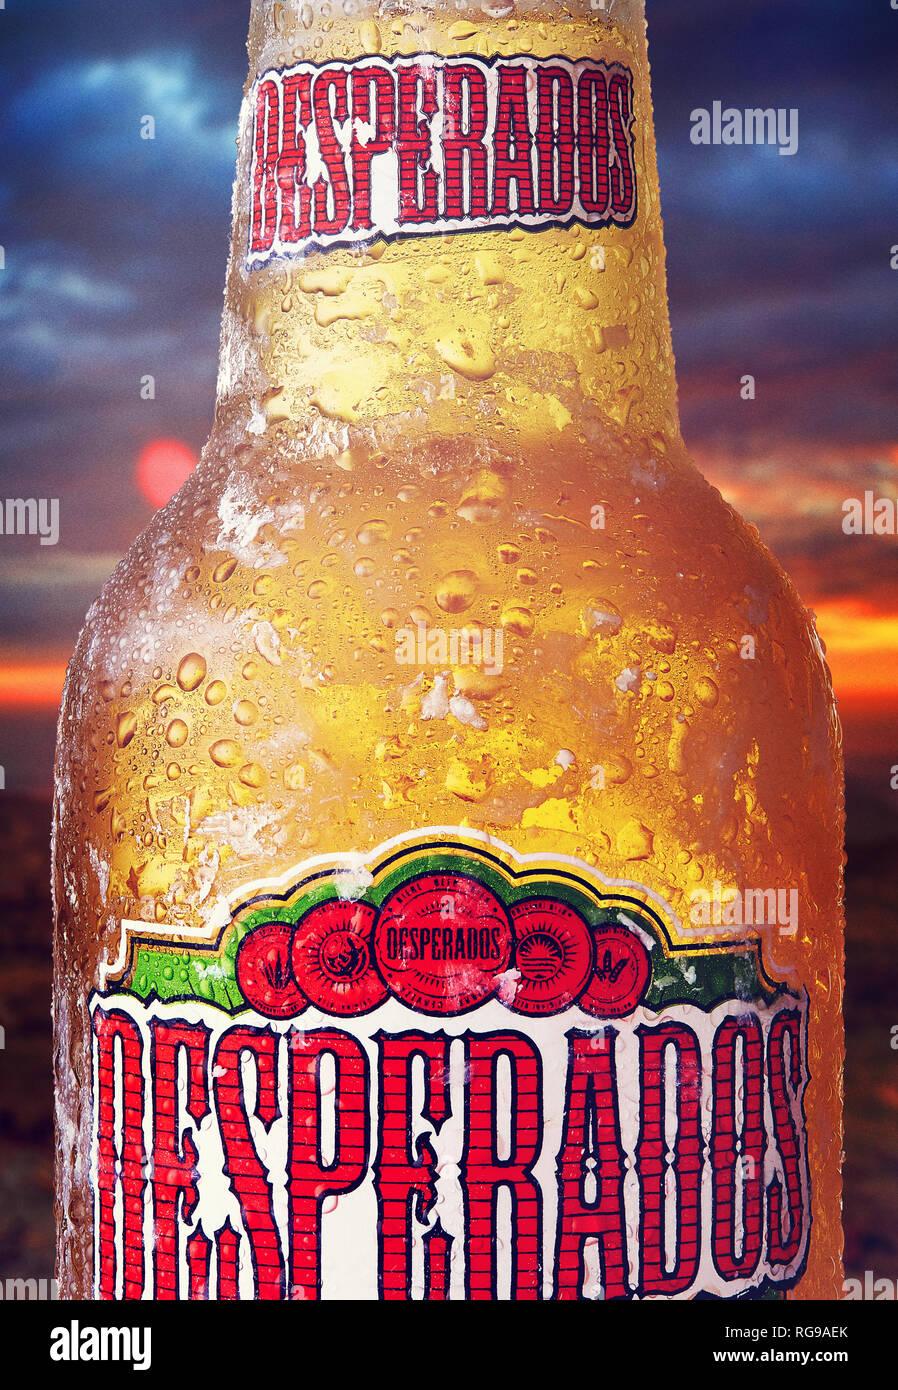 Cold Desperados Drink Alcohol Stock Photo Alamy